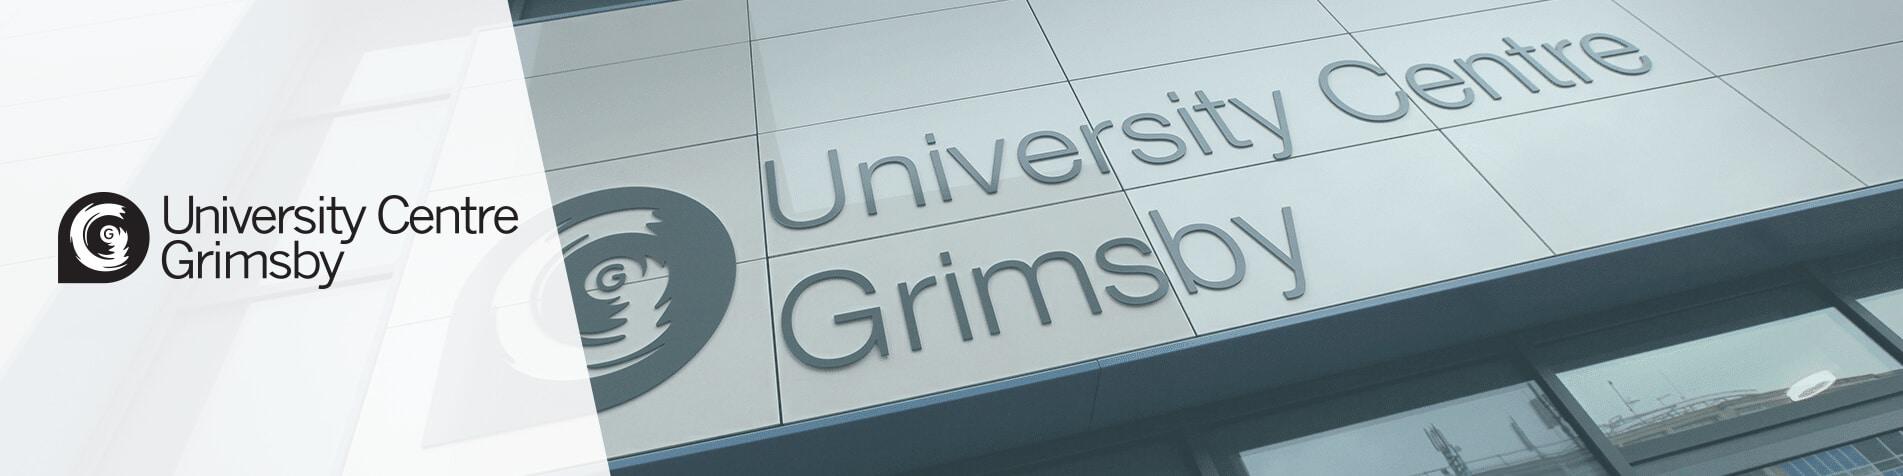 University Centre Grimsby